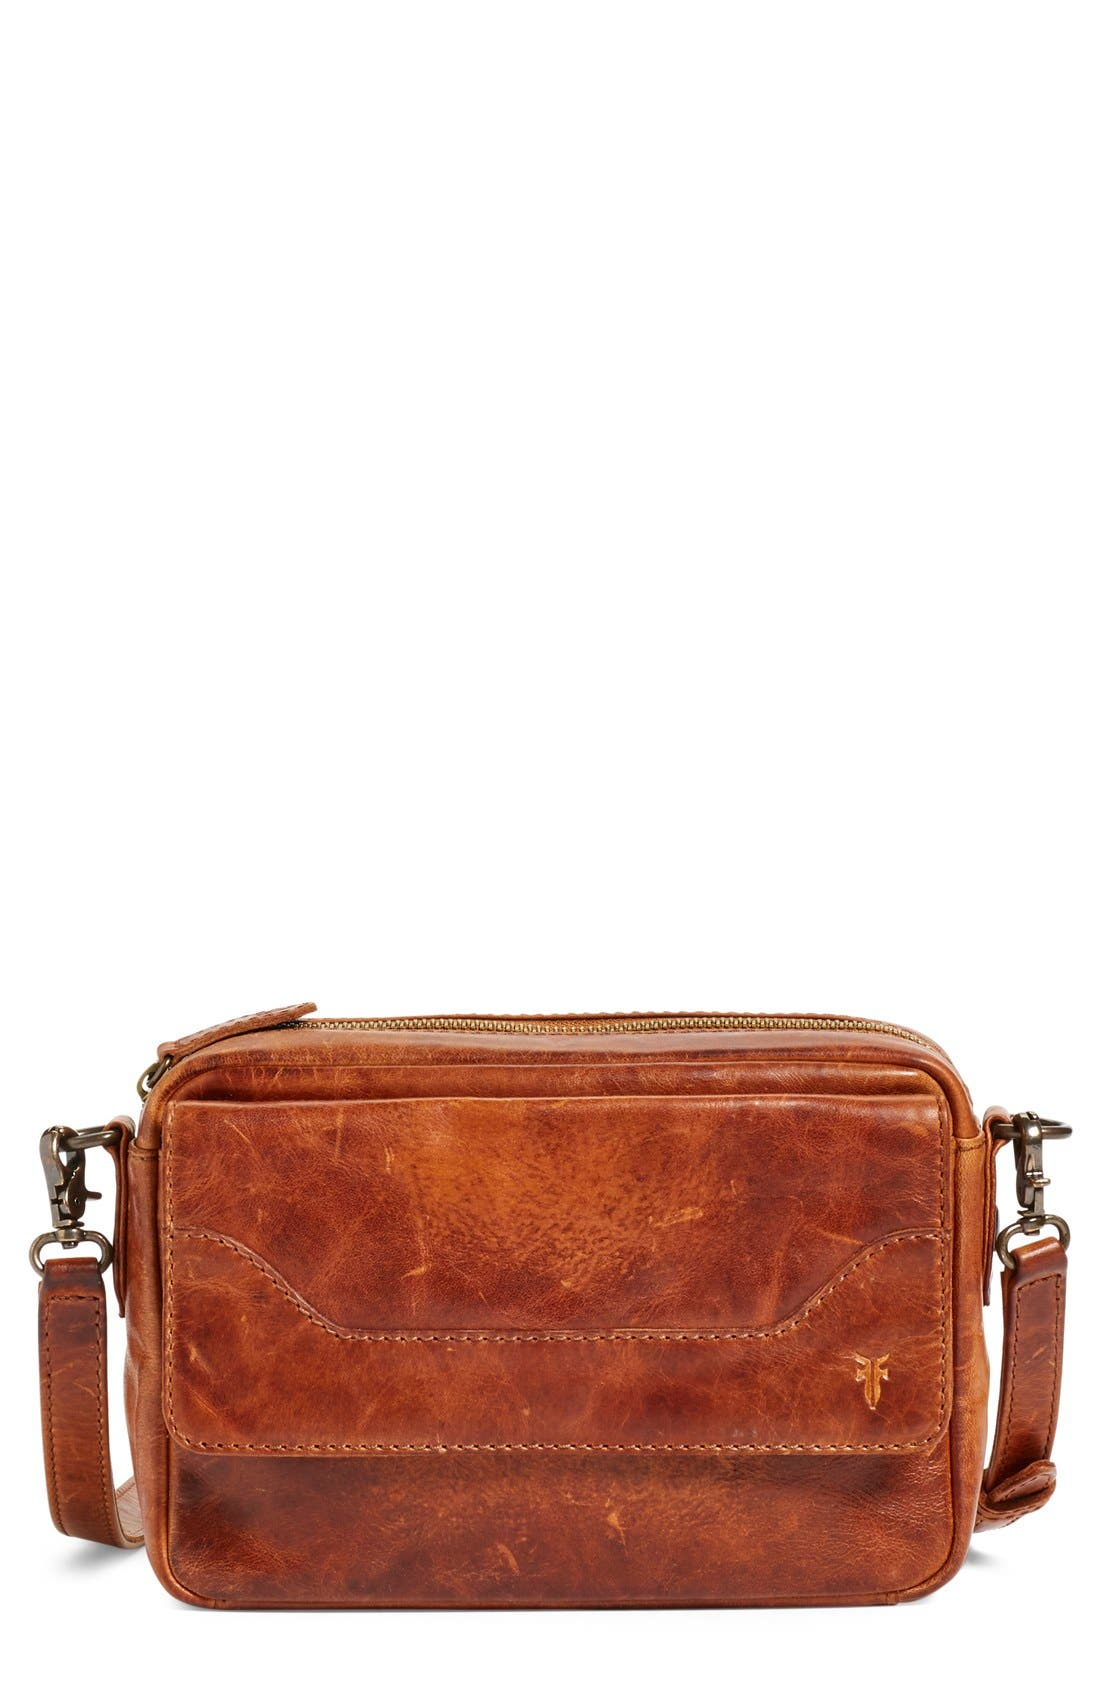 'Melissa' Leather Camera Crossbody Bag,                             Main thumbnail 1, color,                             200